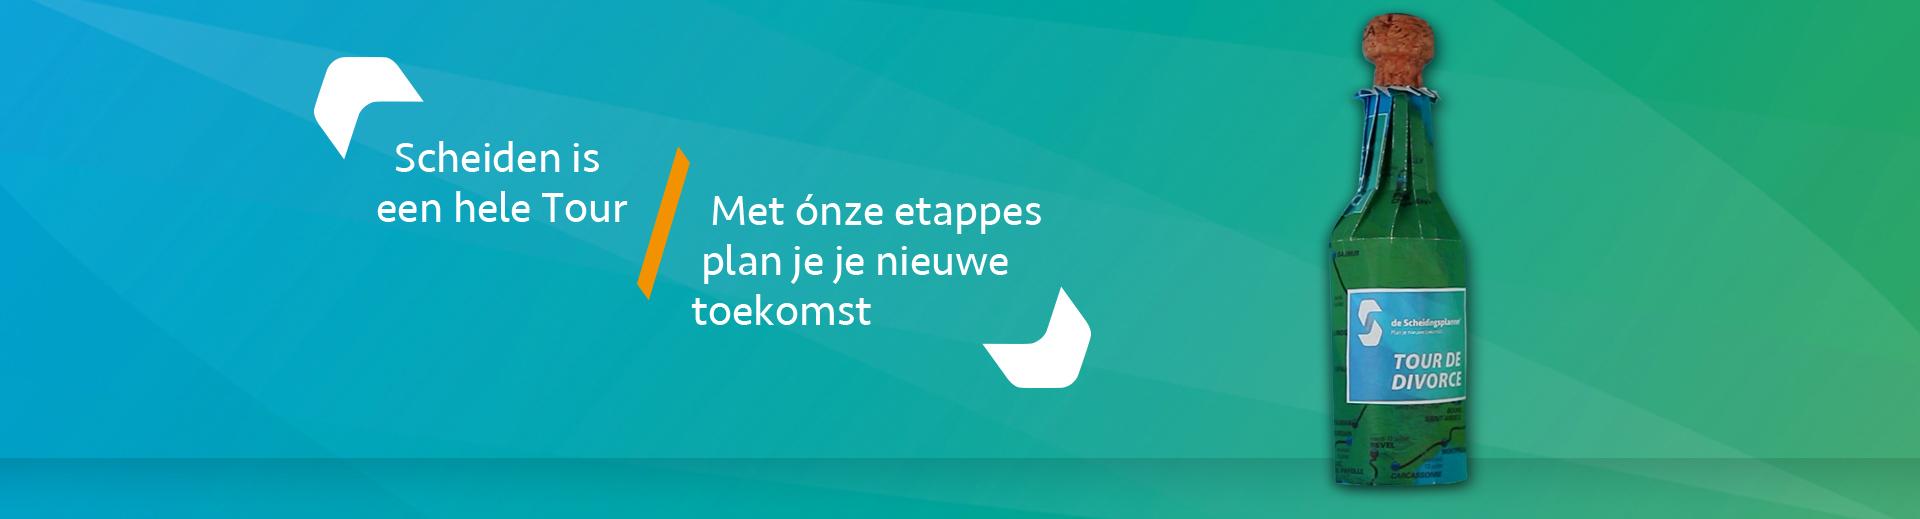 Volg onze Tour de Divorce - Scheidingsplanner Hilversum | Bilthoven | Soest | 't Gooi